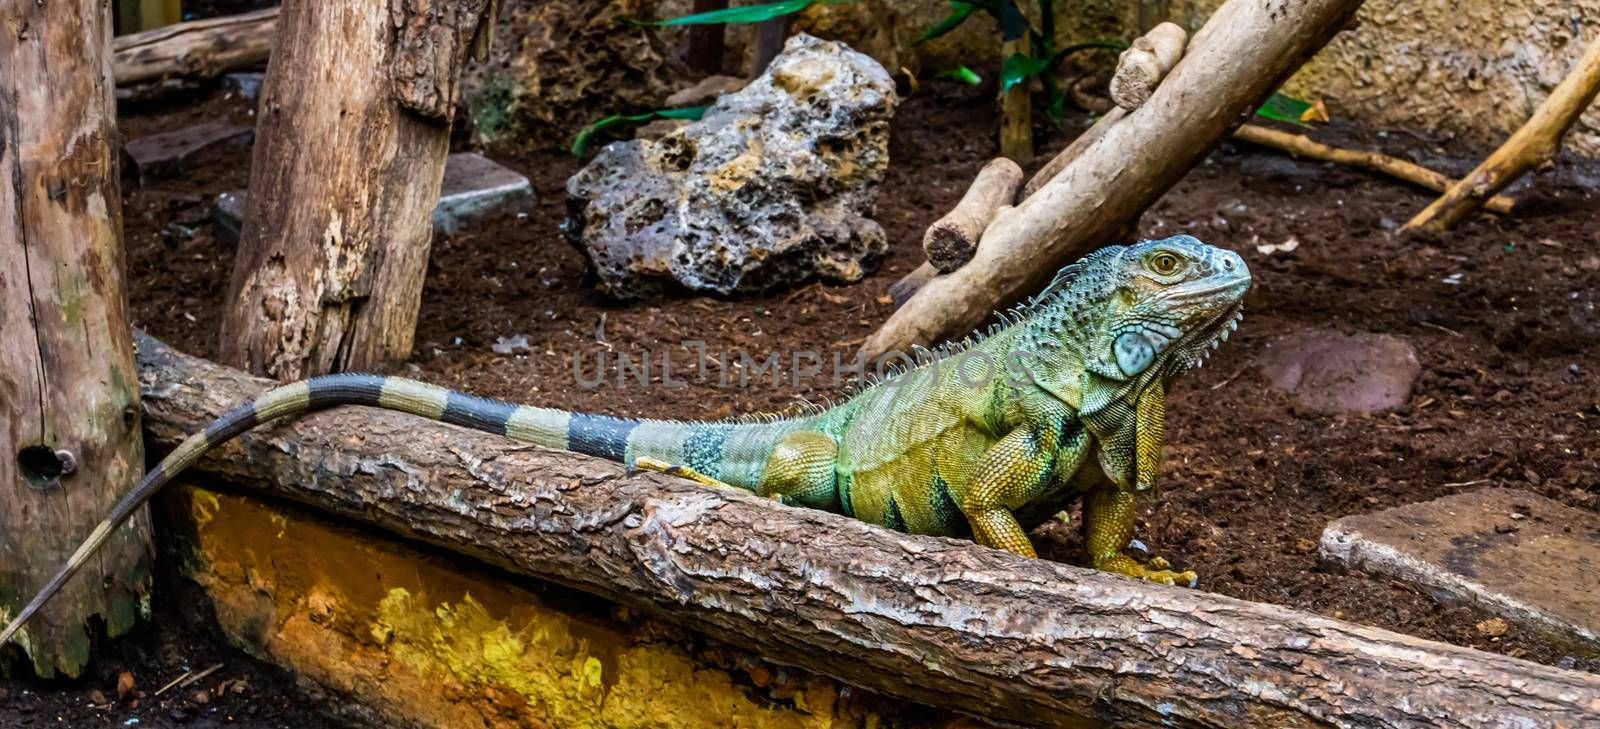 green american iguana in closeup, popular tropical reptile specie from America